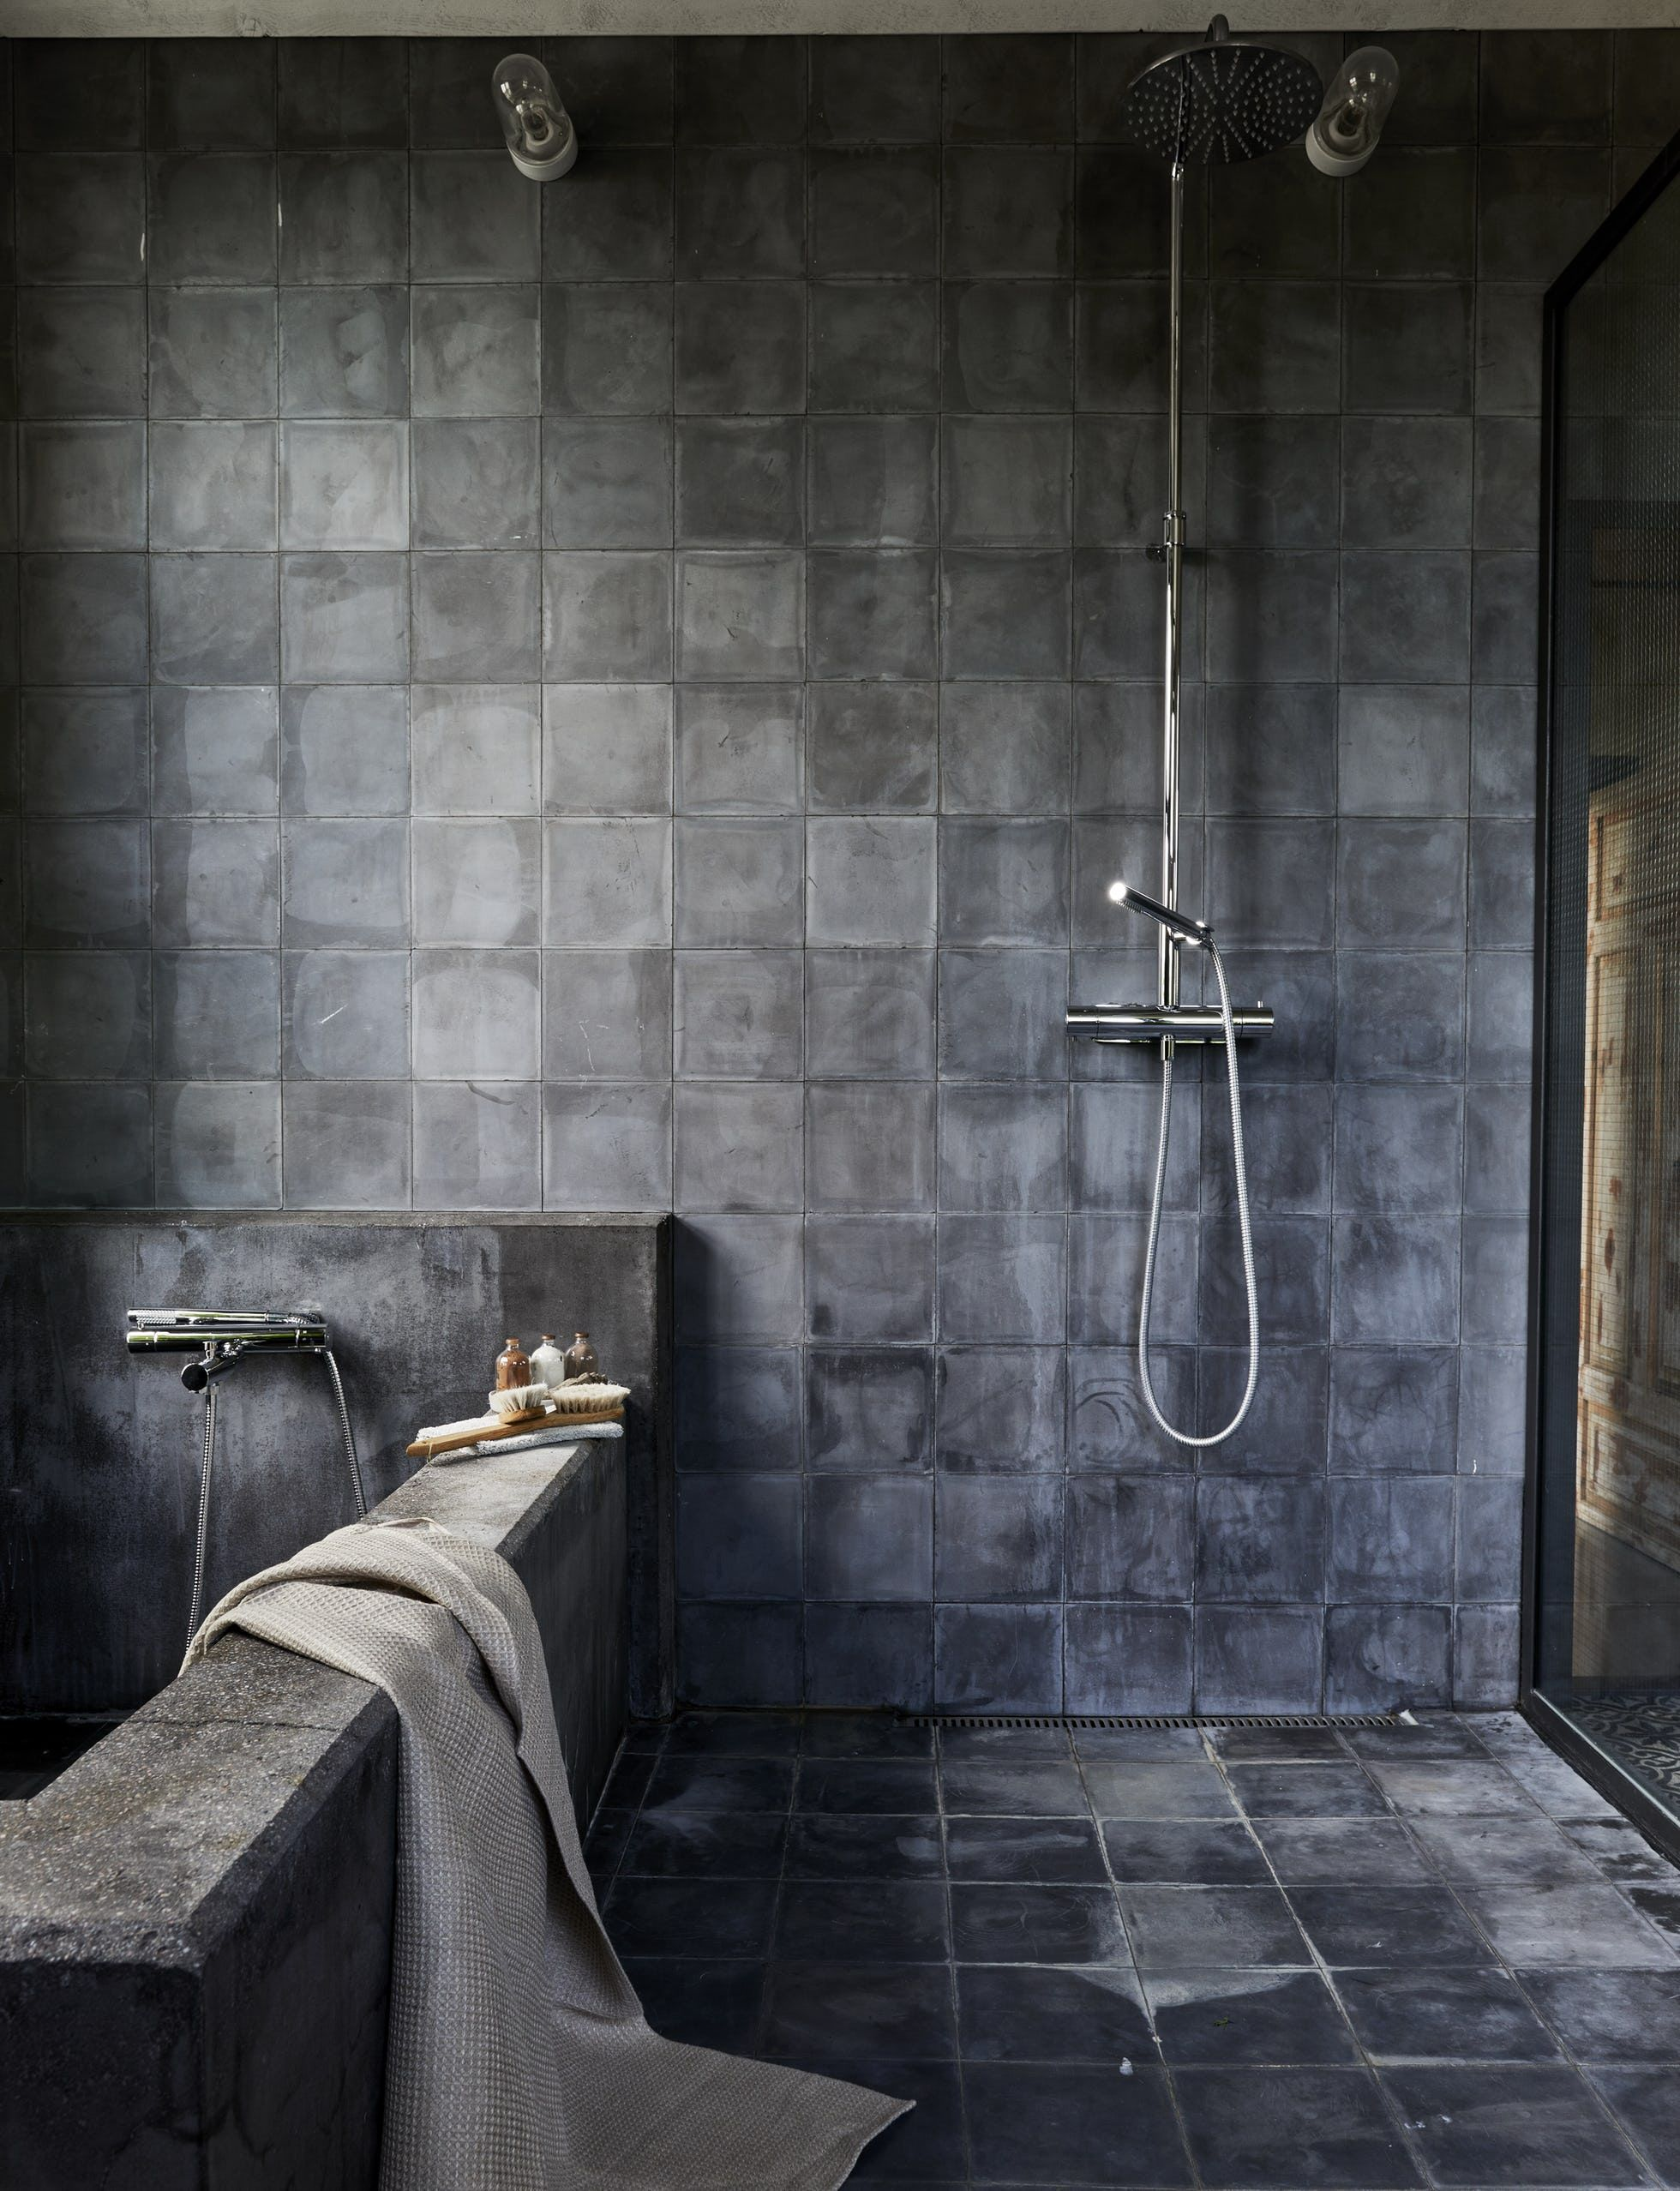 31 Bathroom Tile Ideas Make It Fresh And Not Boring Black Tile